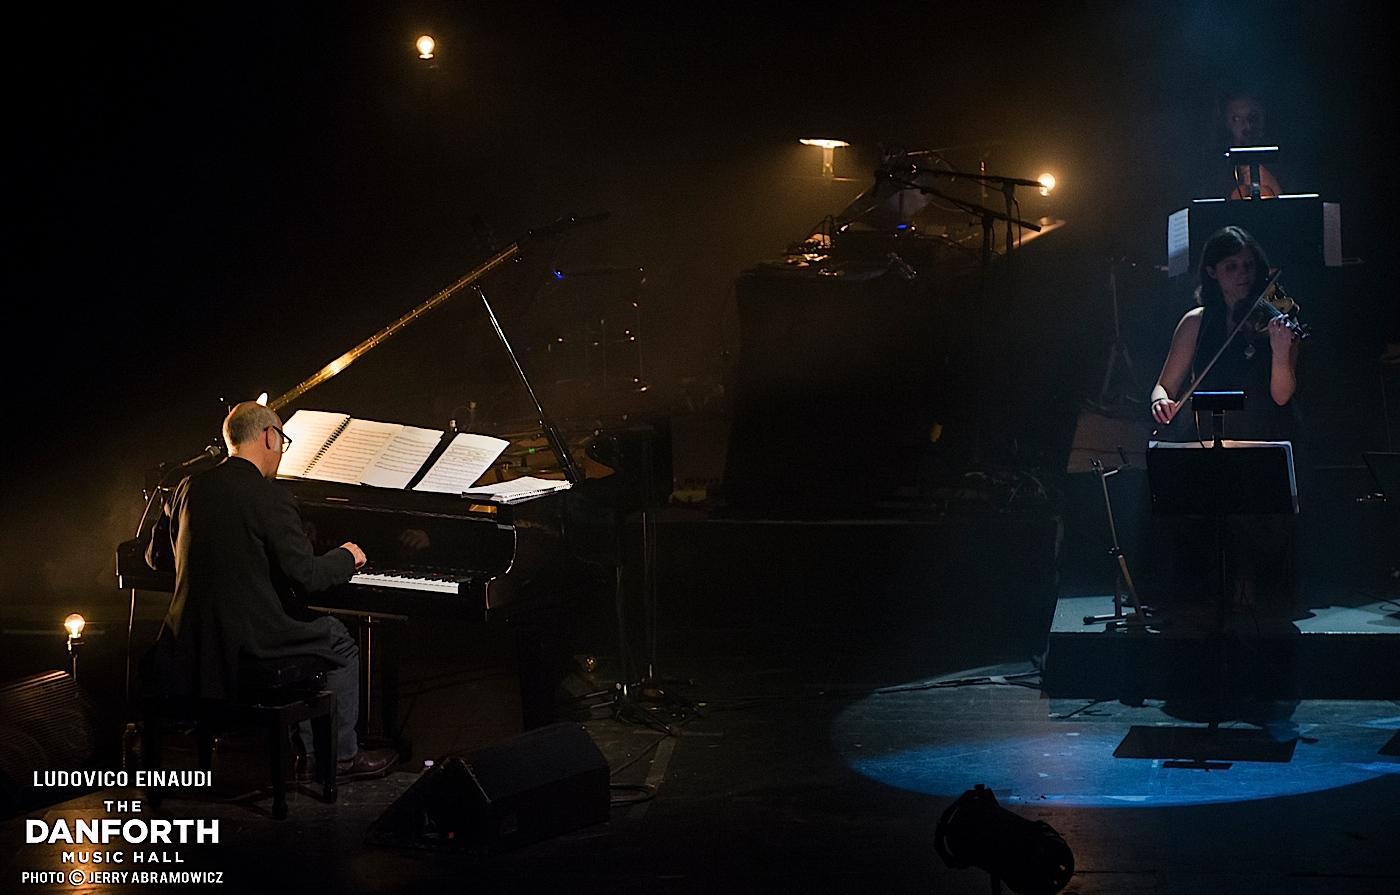 20130517 Ludovico Einaudi performs at The Danforth Music Hall Toronto 0195